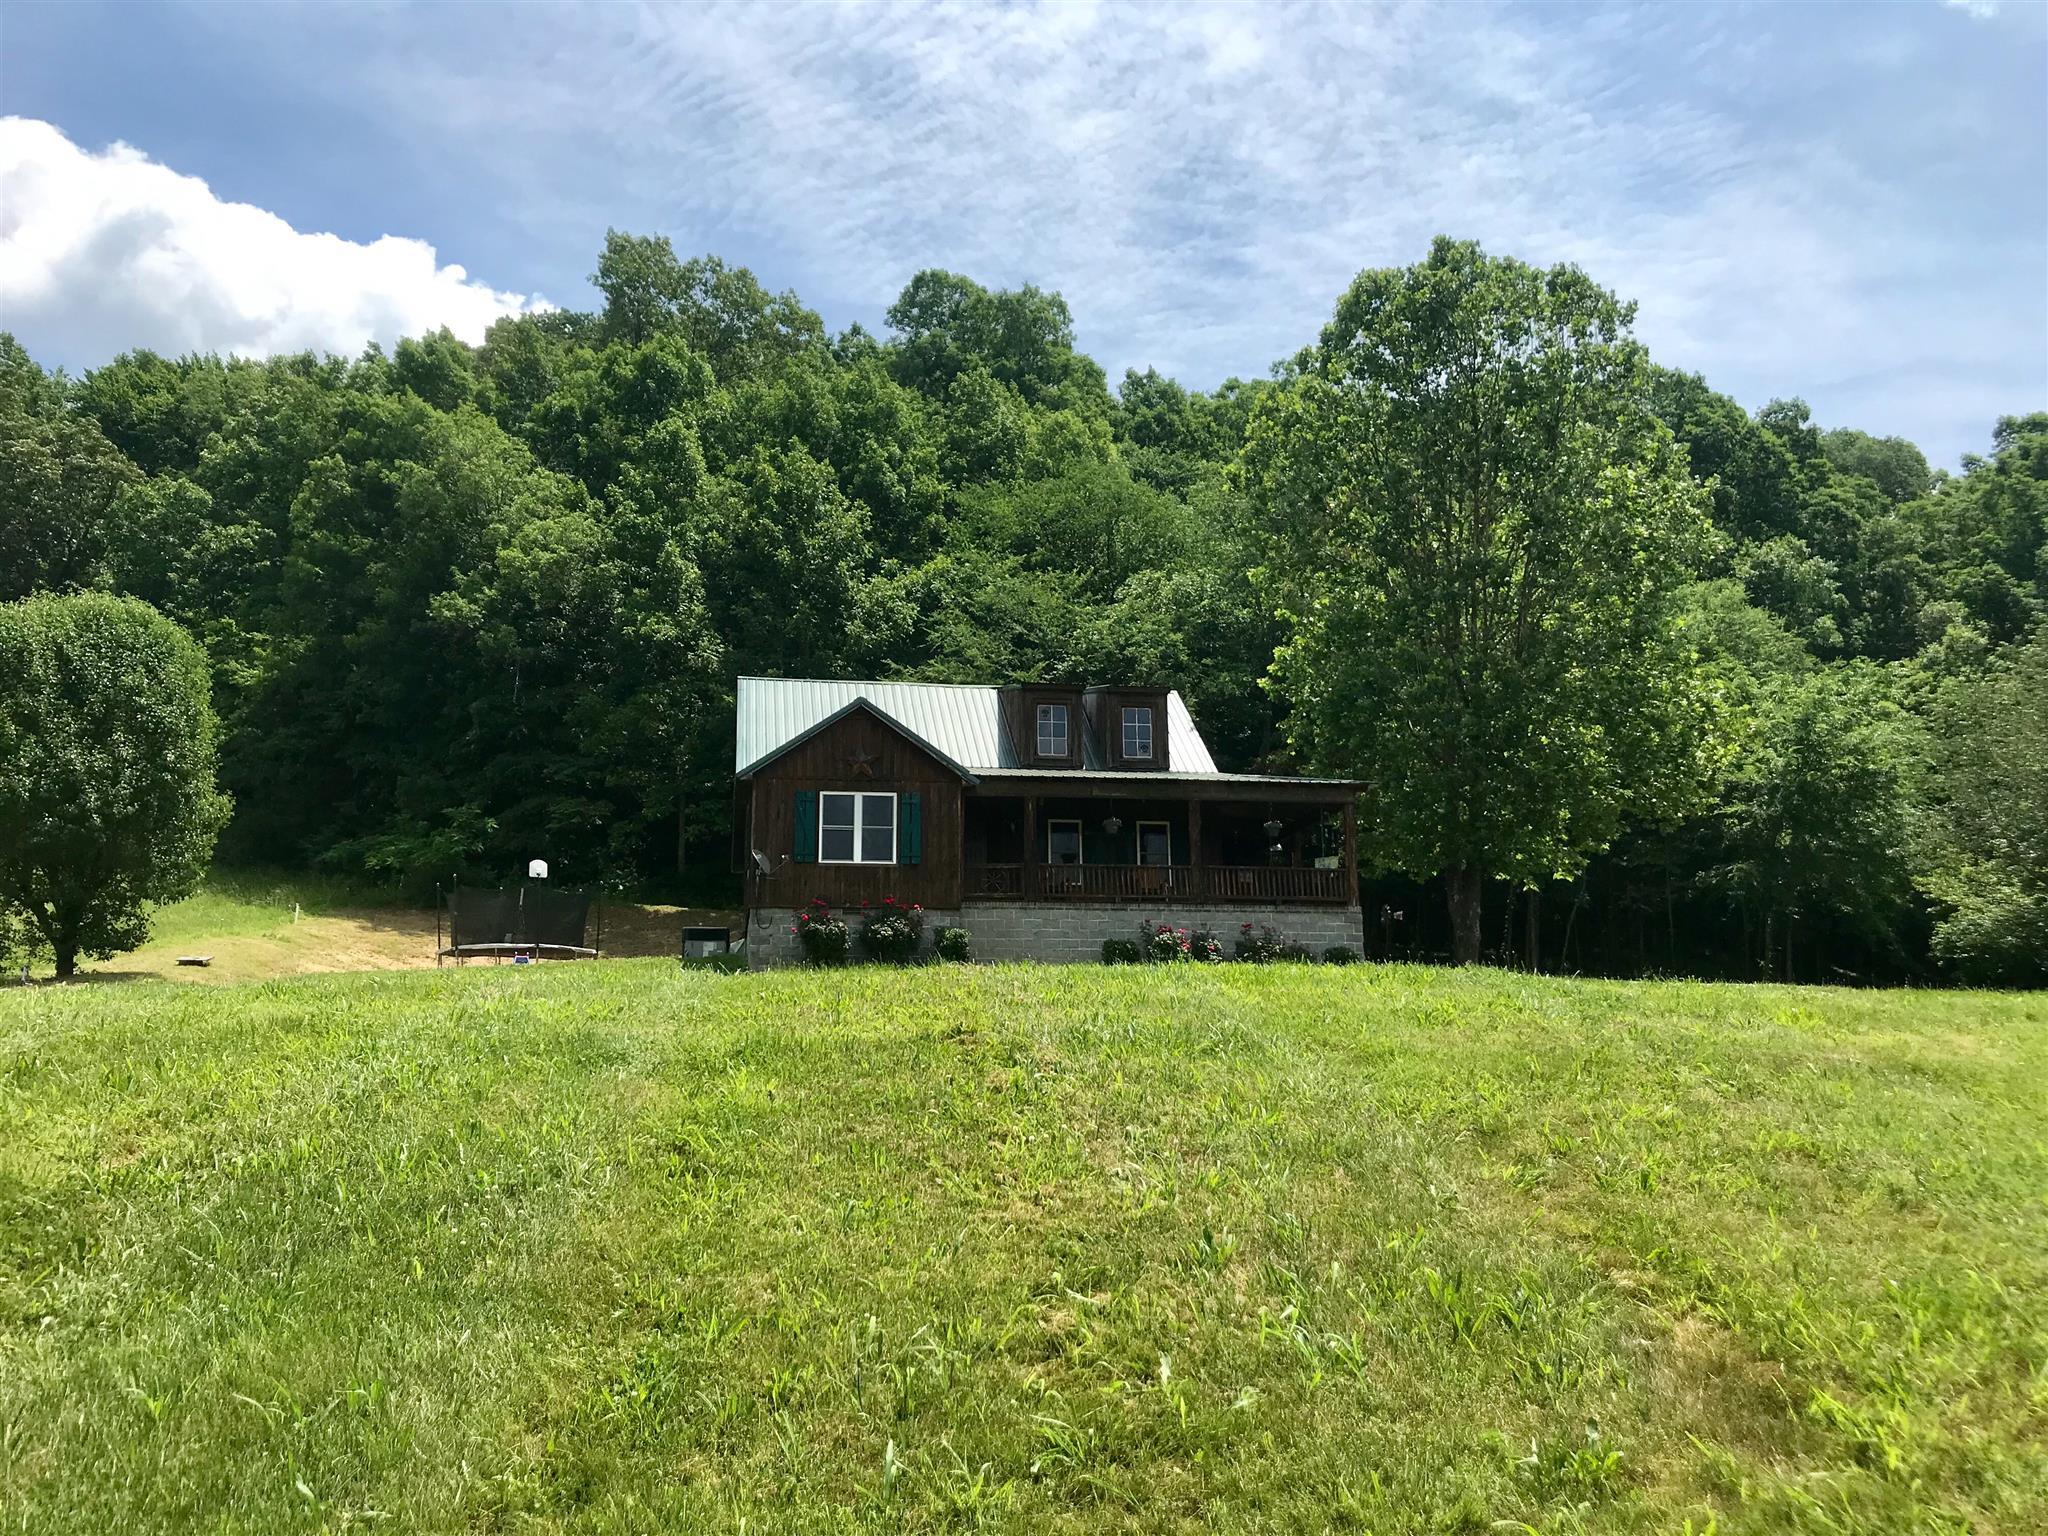 474 Long Branch Rd, Lawrenceburg, TN 38464 - Lawrenceburg, TN real estate listing